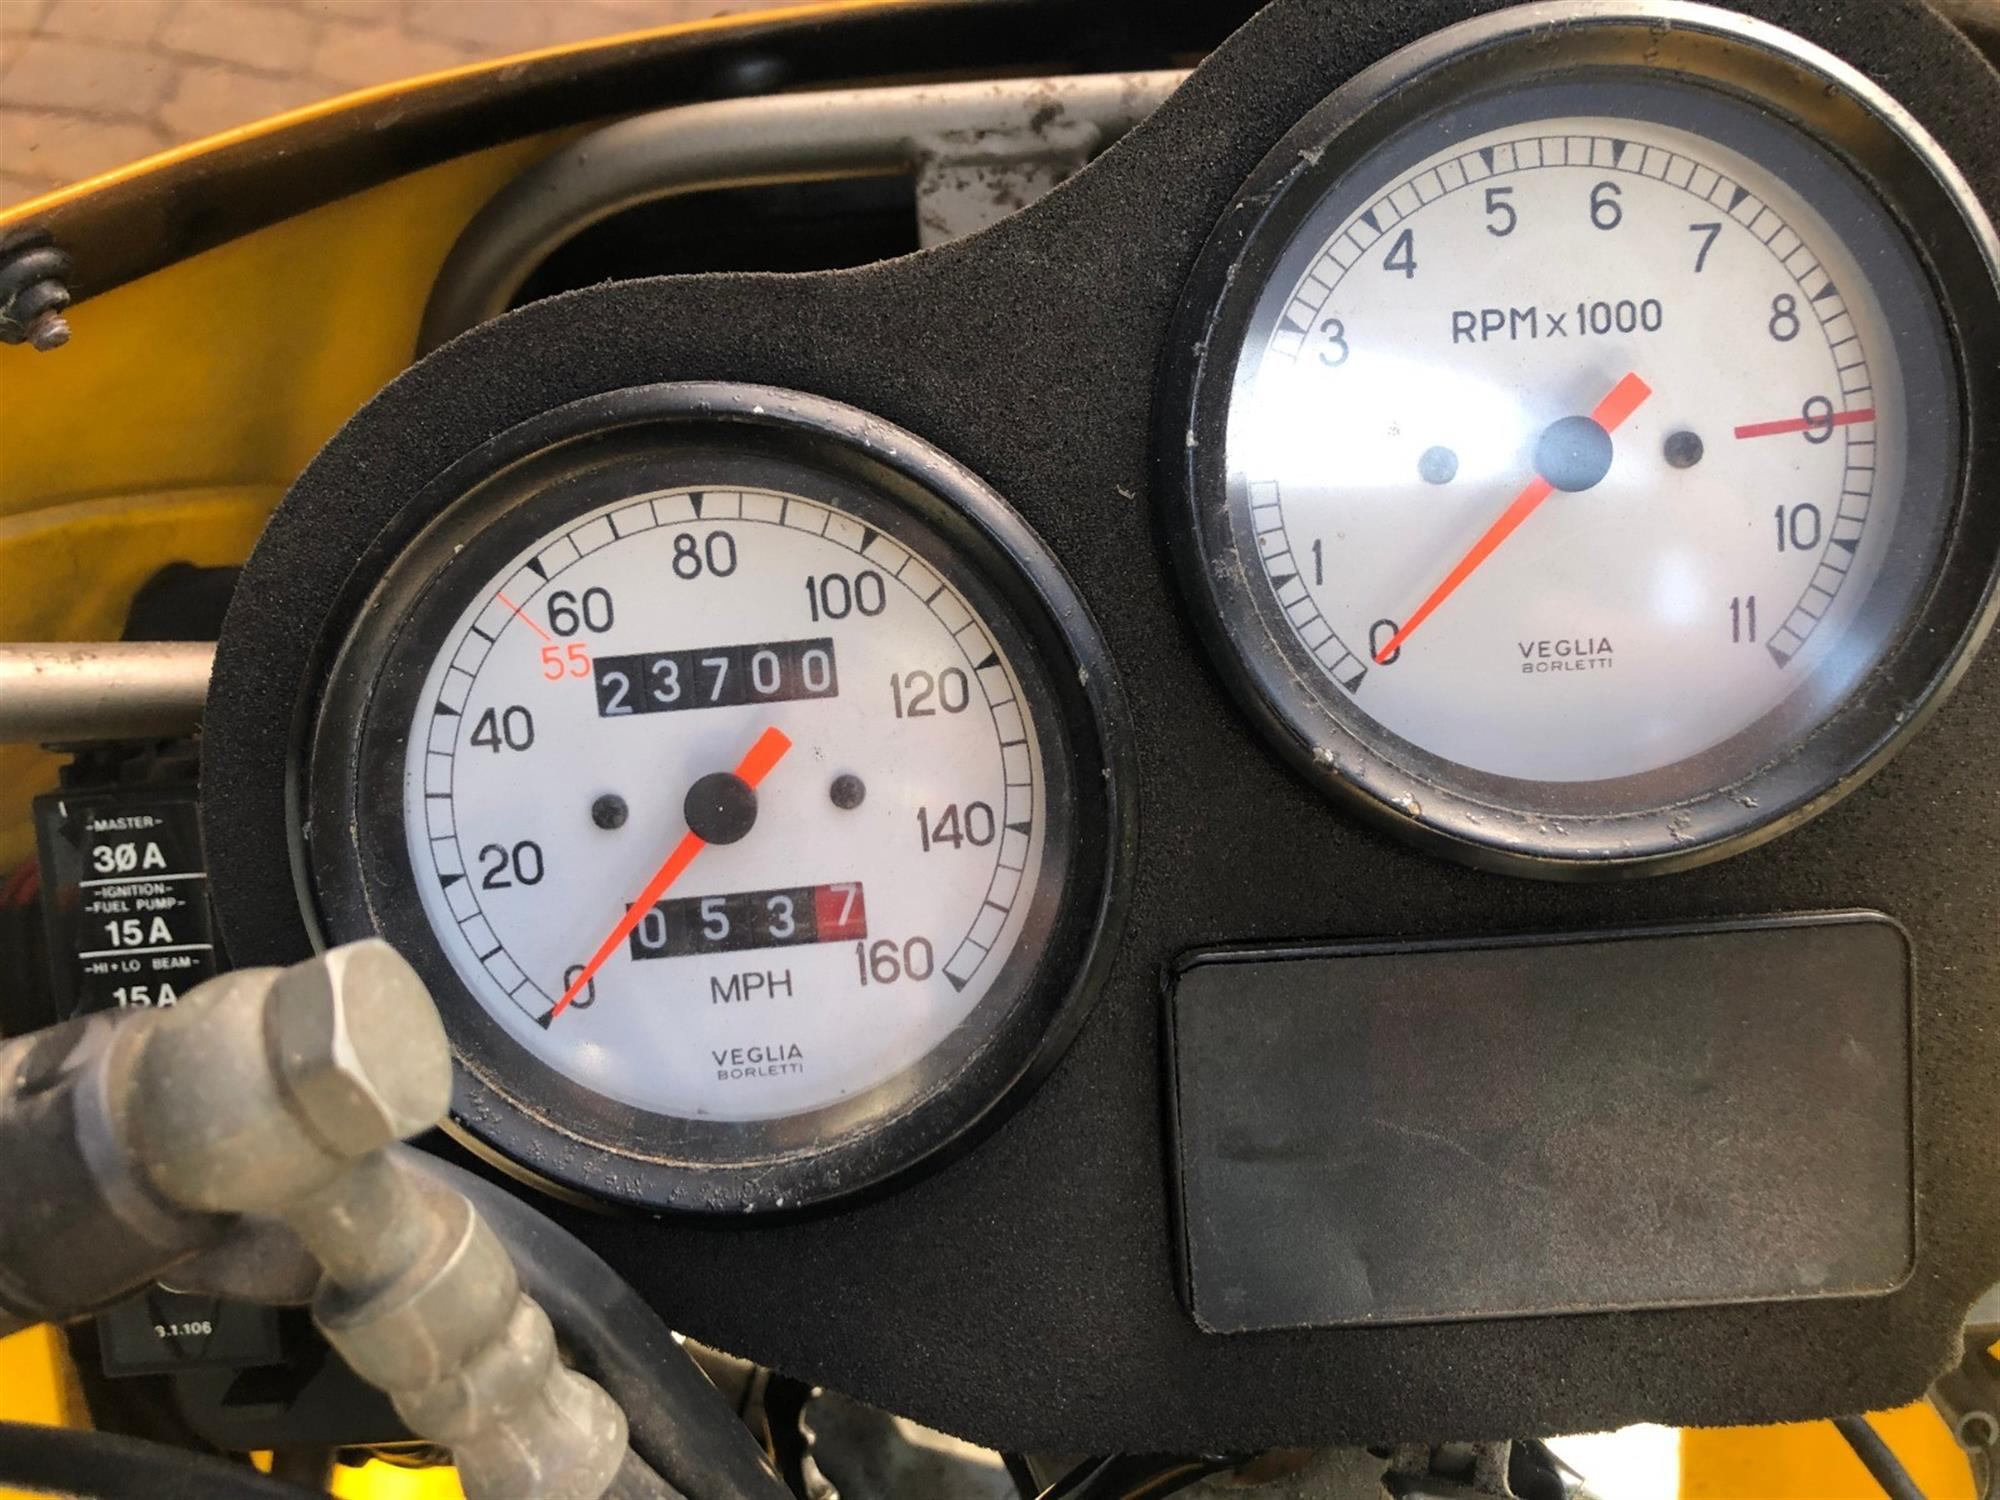 1994 Ducati 900 Superlight III - Image 3 of 8